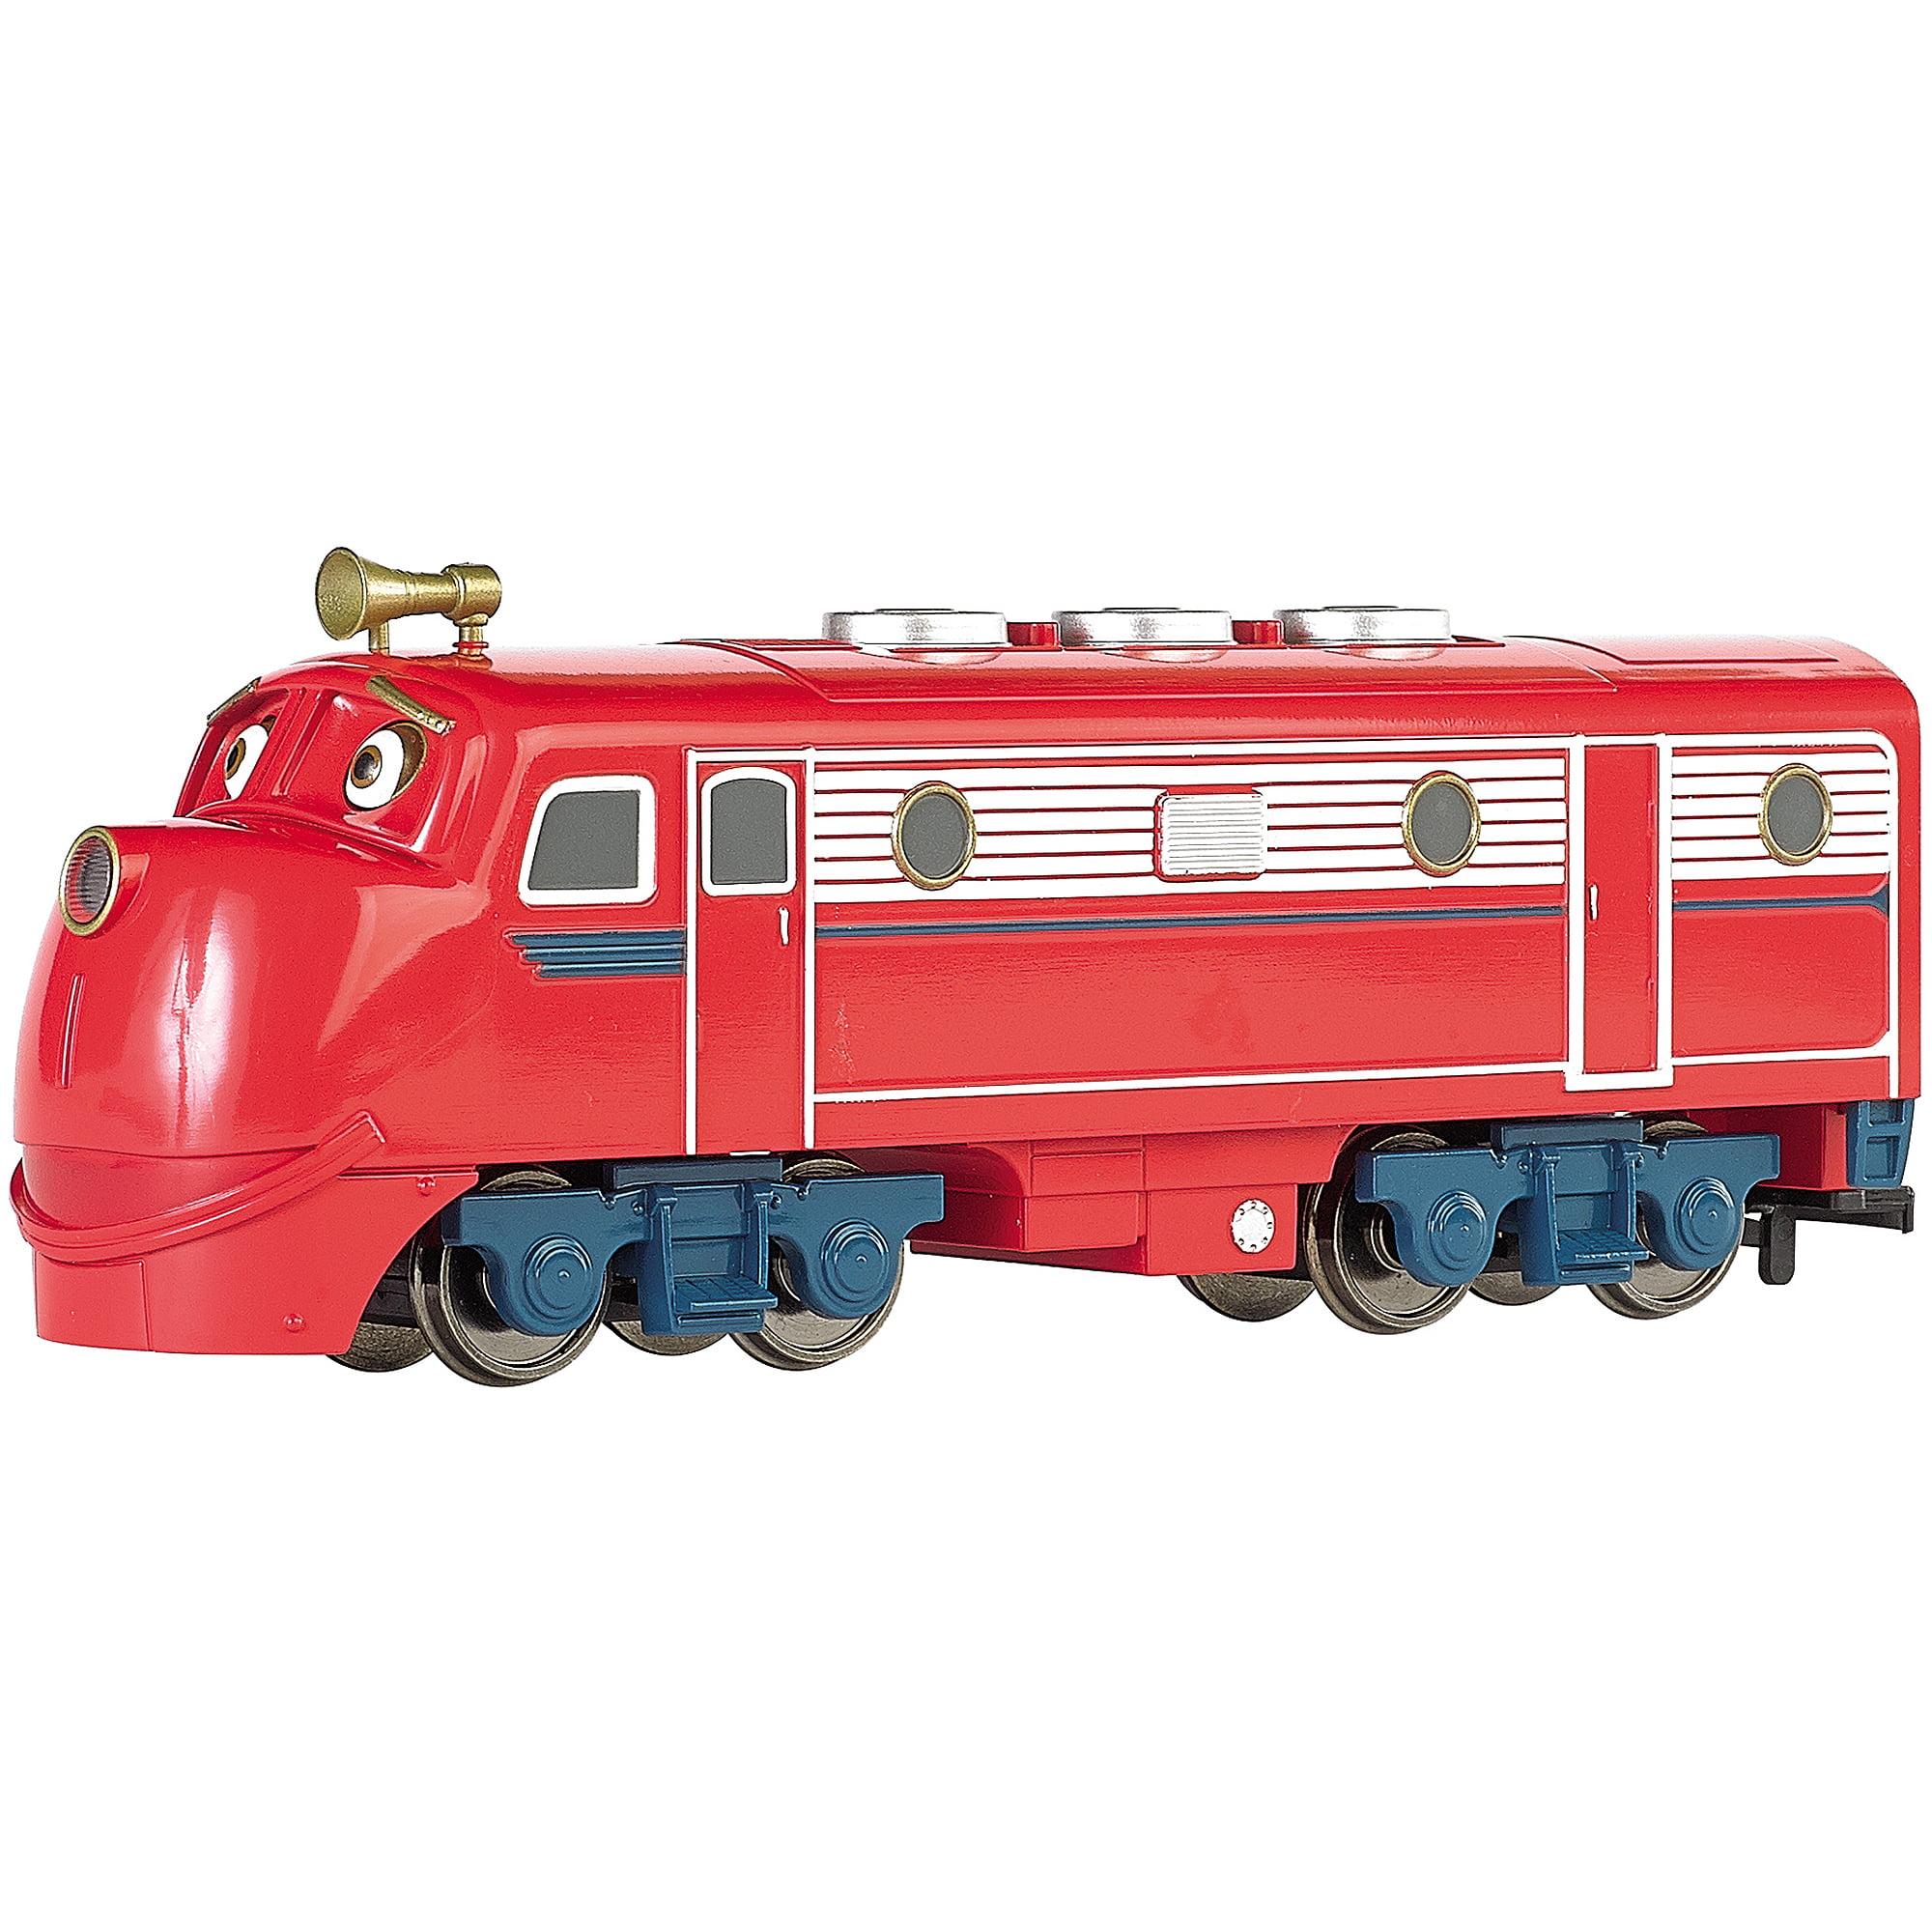 Bachmann Trains Chuggington Wilson Locomotive with Operating Headlight, HO Scale Train by Bachmann